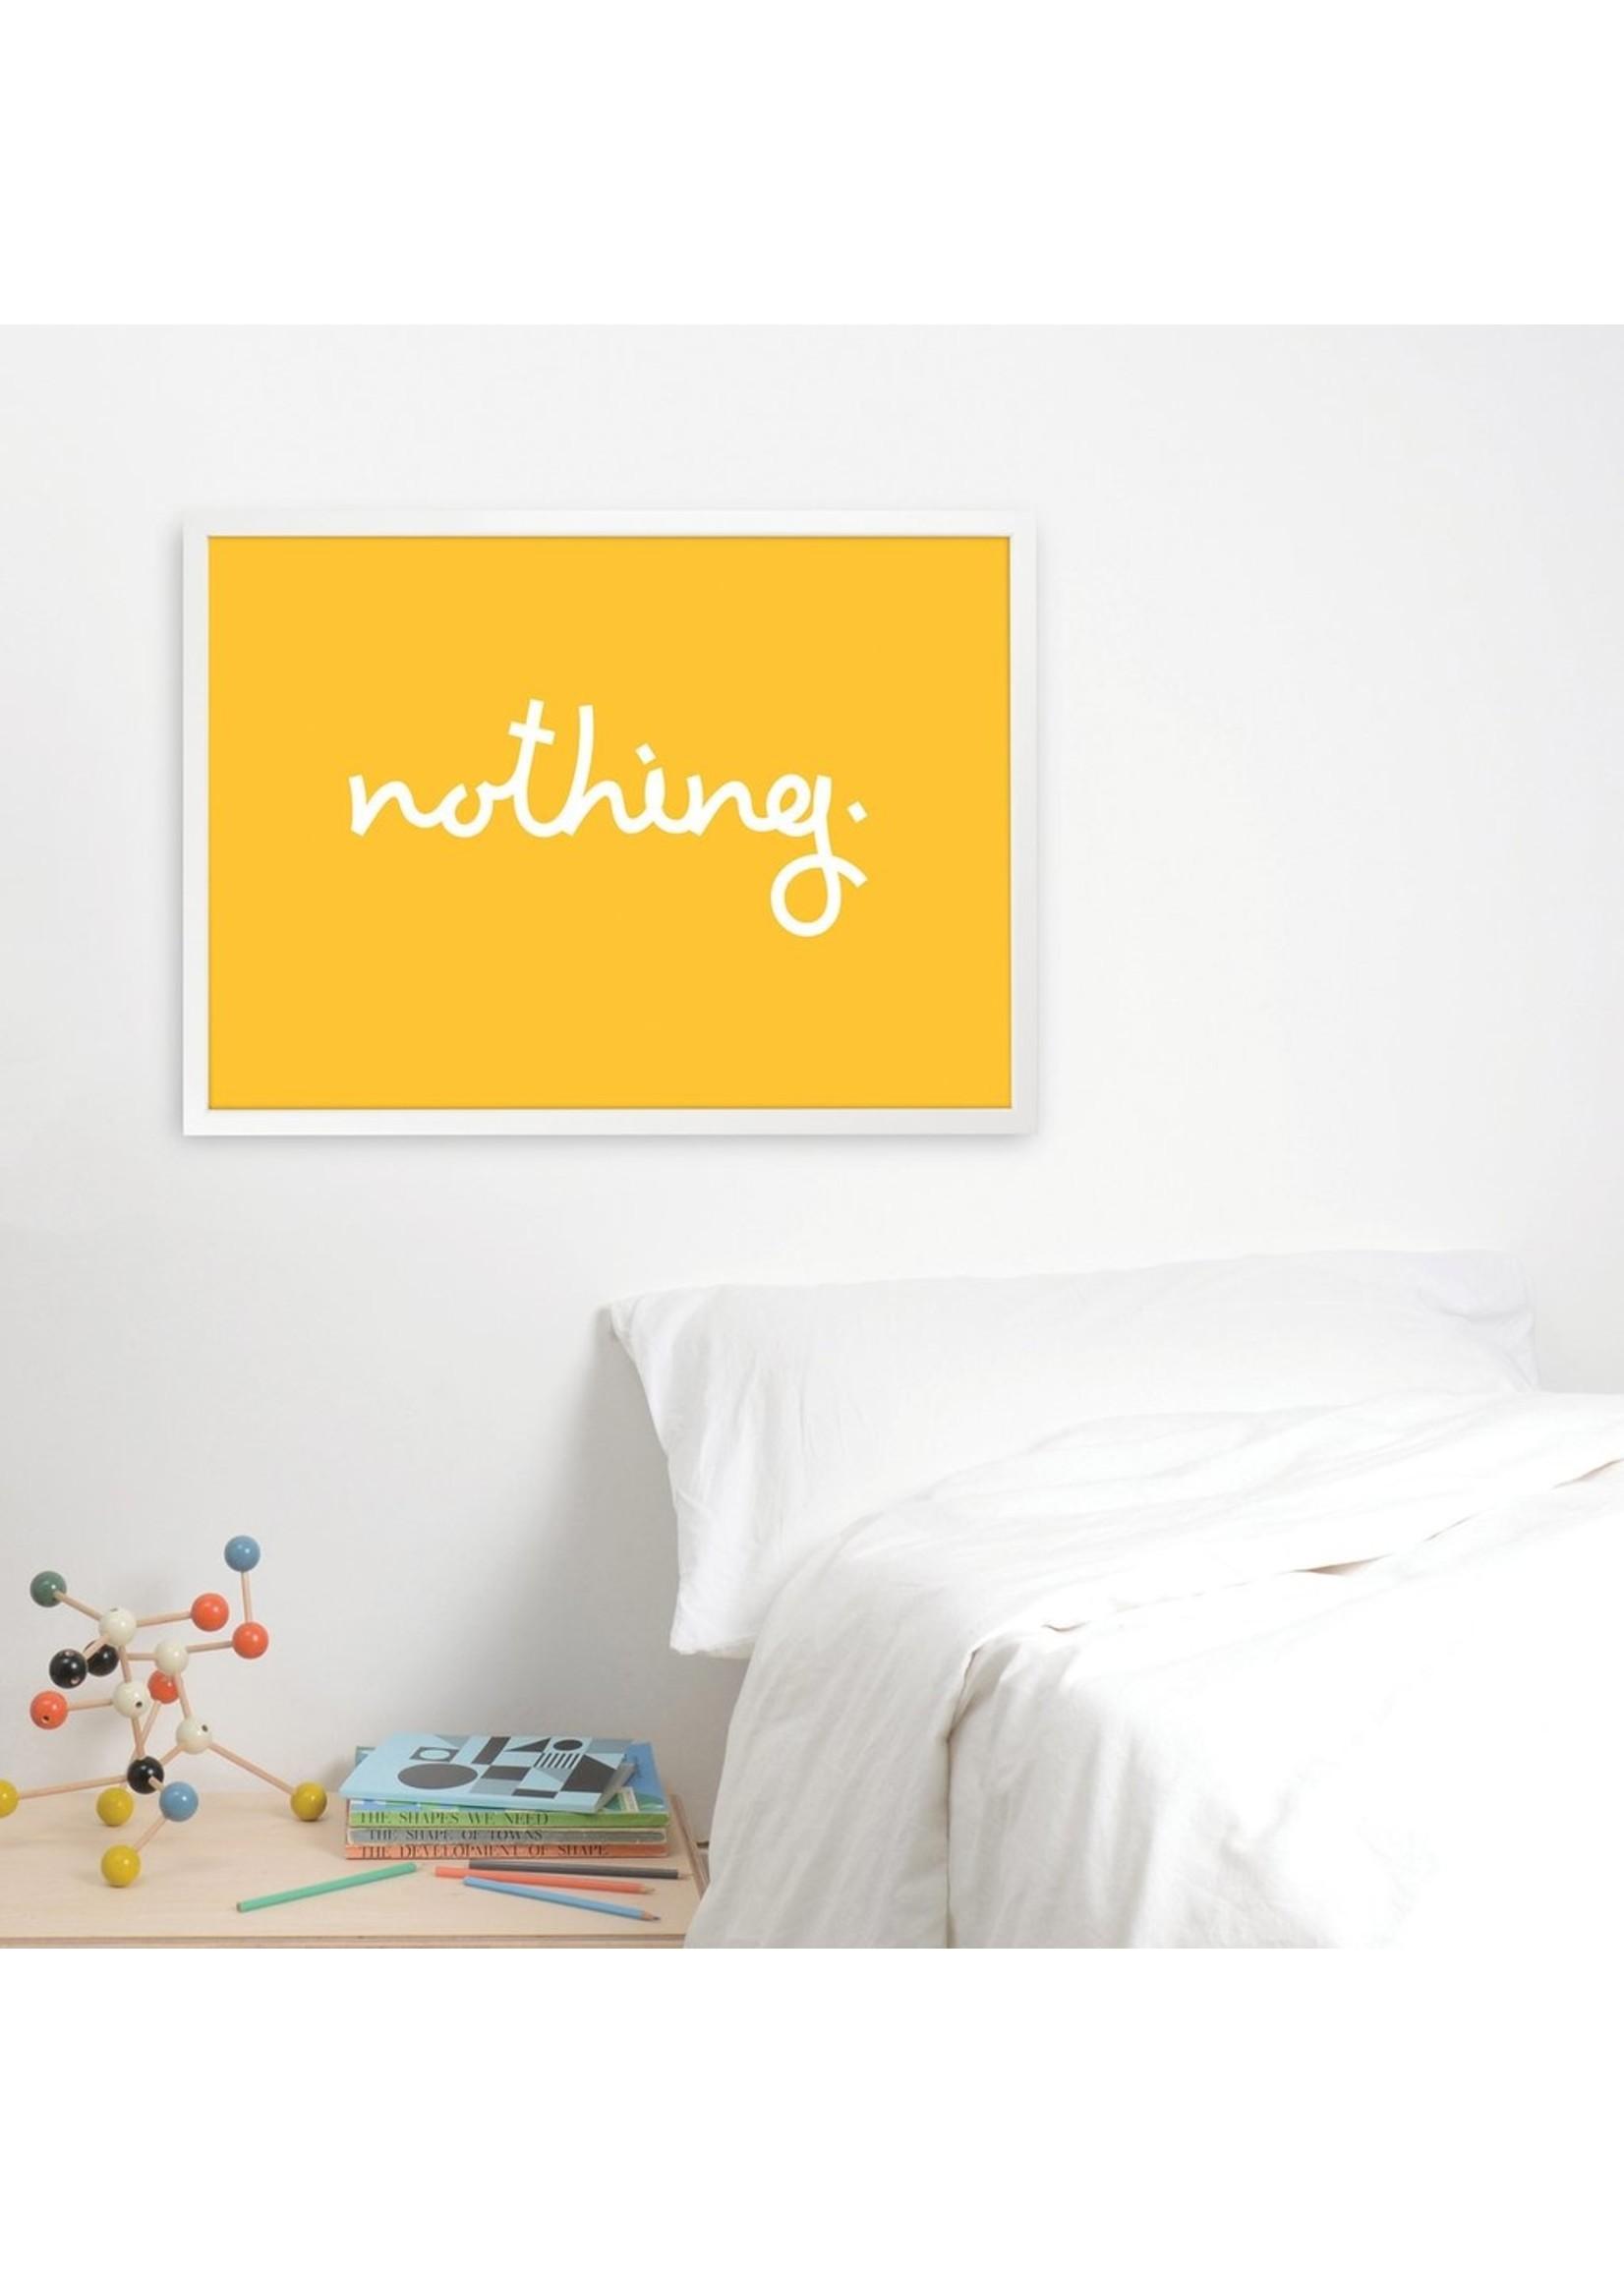 Tom Pigeon Tom Pigeon 'Nothing' Print - 700x500